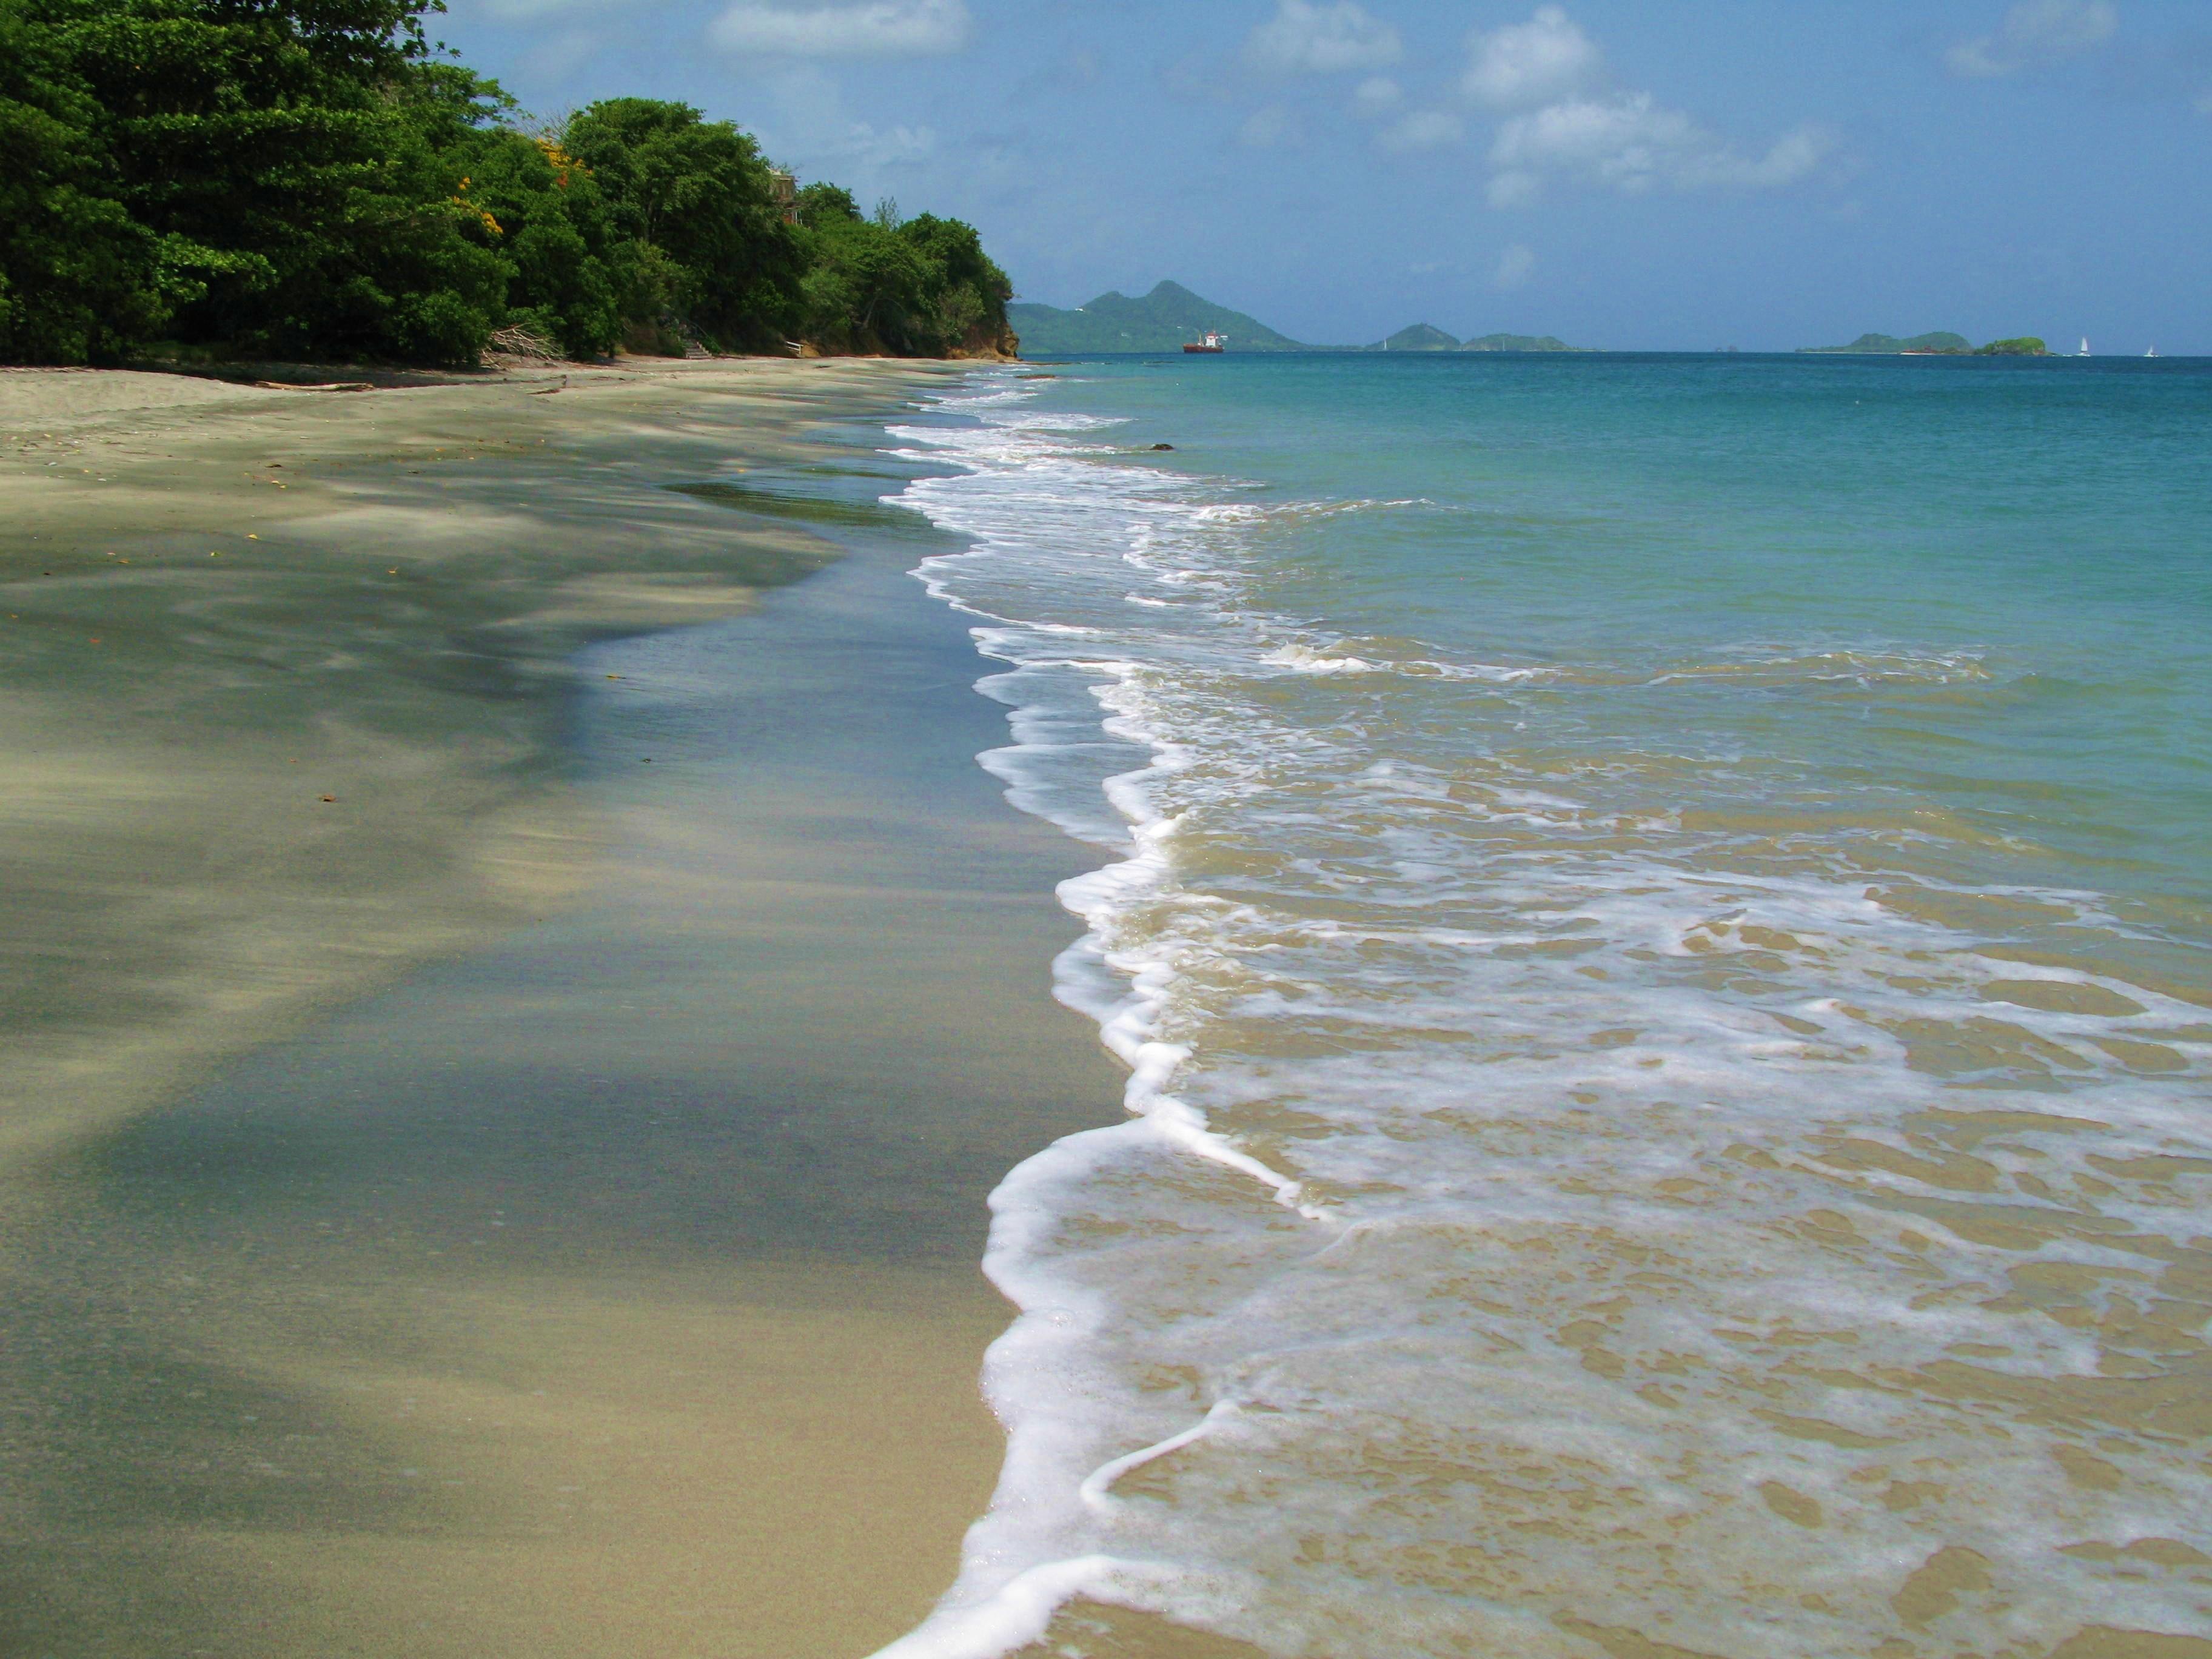 Sparrow Bay is a ten minute walk